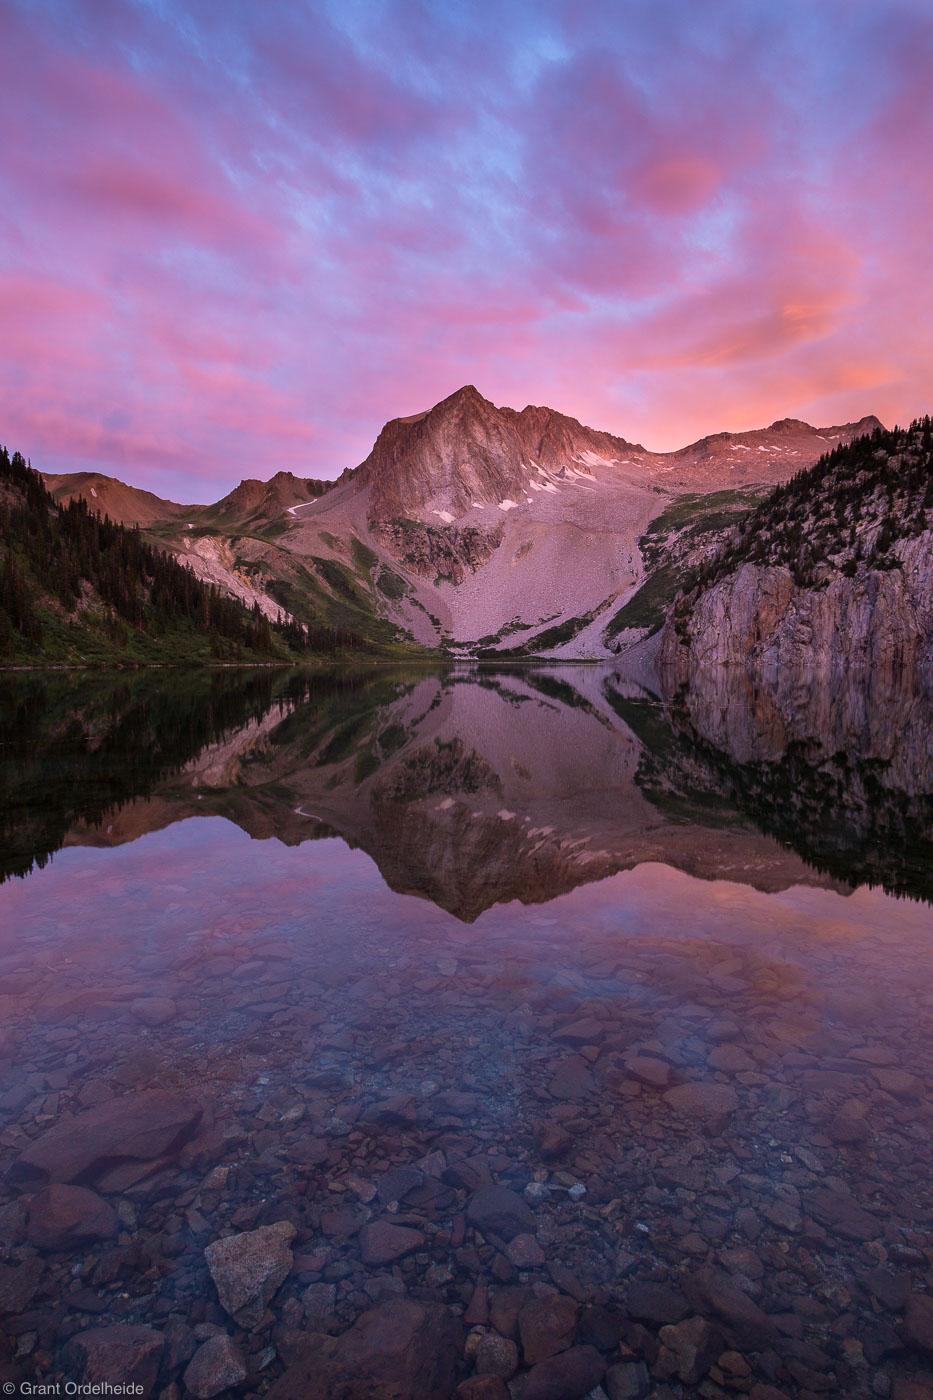 snowmass, lake, maroon bells, wilderness, aspen, colorado, reflected, sunrise, photo